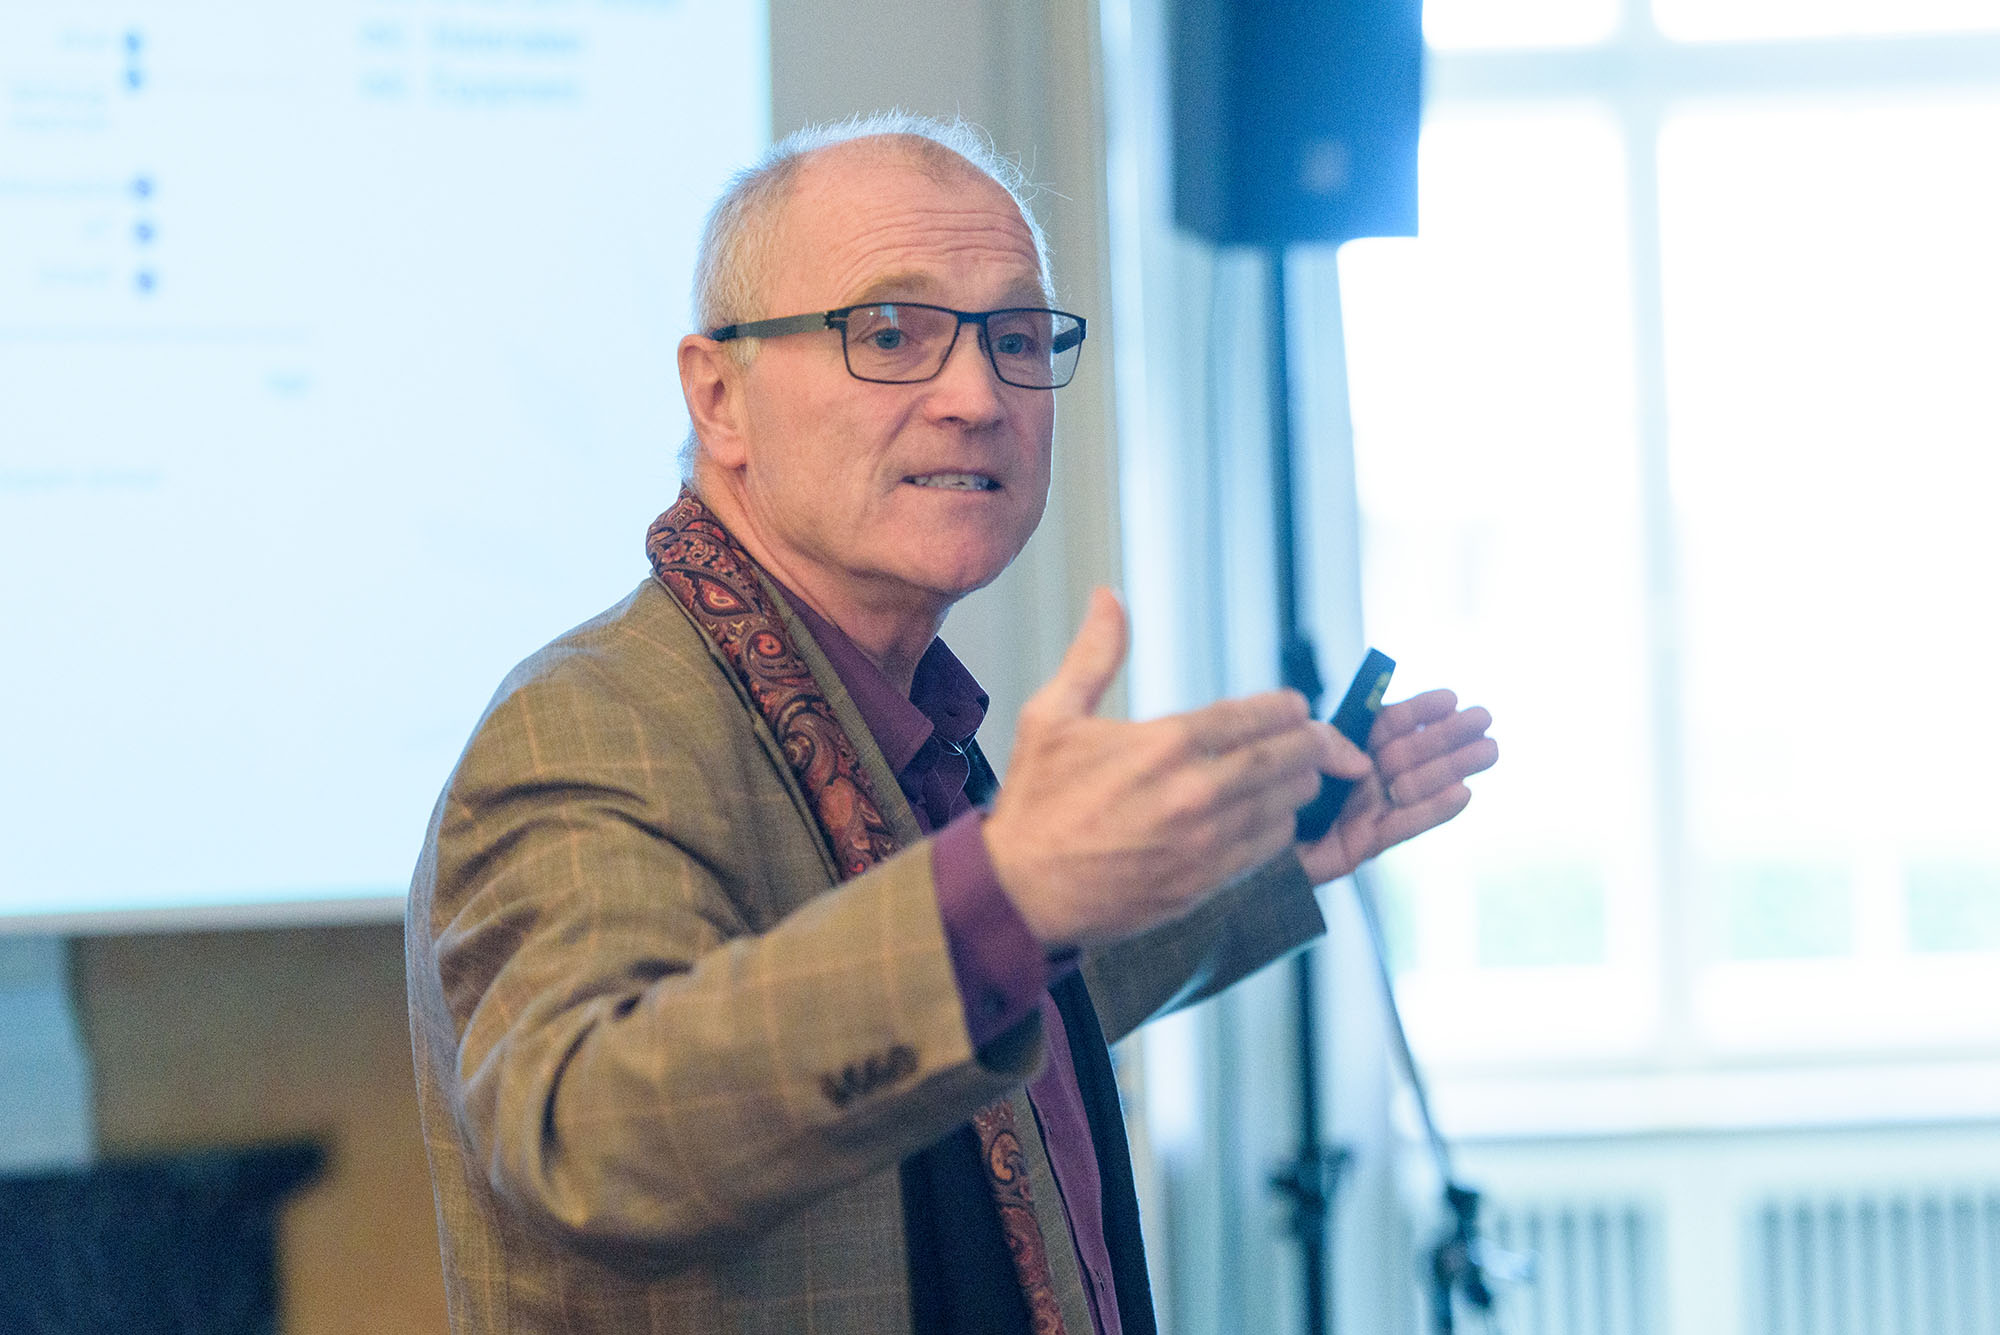 Sylvère Leu, Meyer Burger (Switzerland) AG, General Manager TPC Thun a.i., Formerly CIO MBT